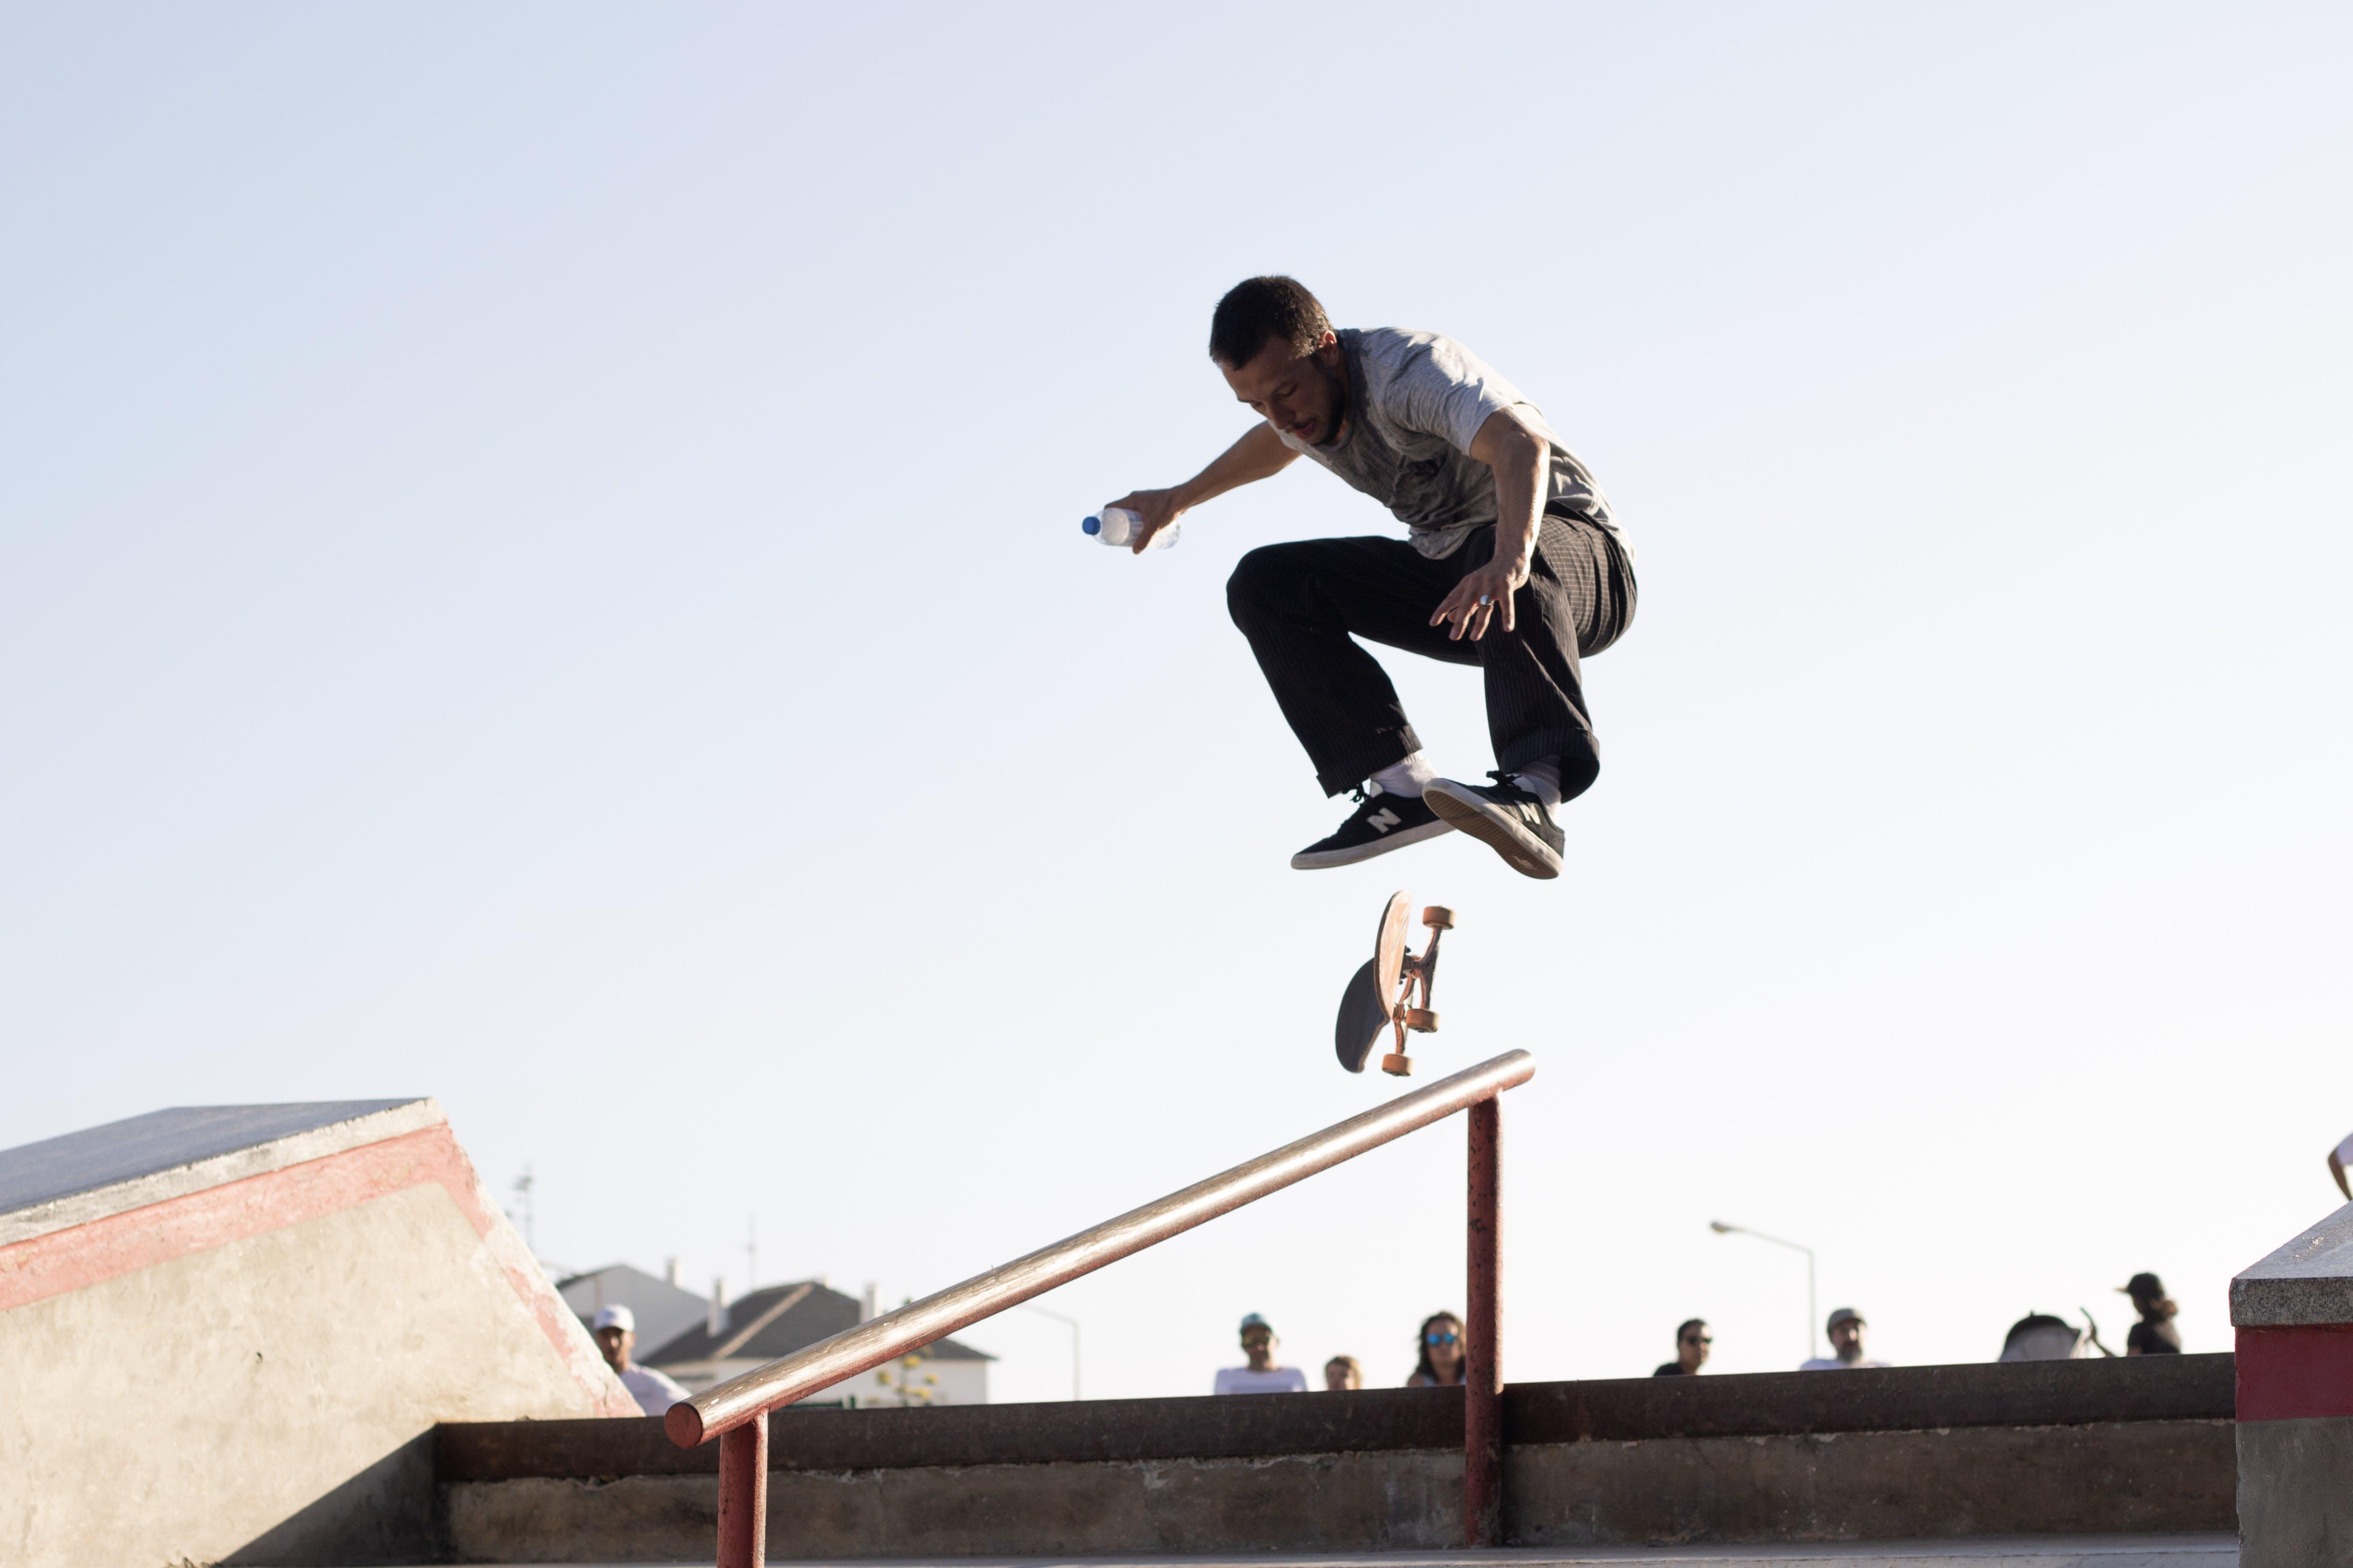 Man Wearing White T-shirt Performing Skateboard Tricks on Rail Under Blue Sky